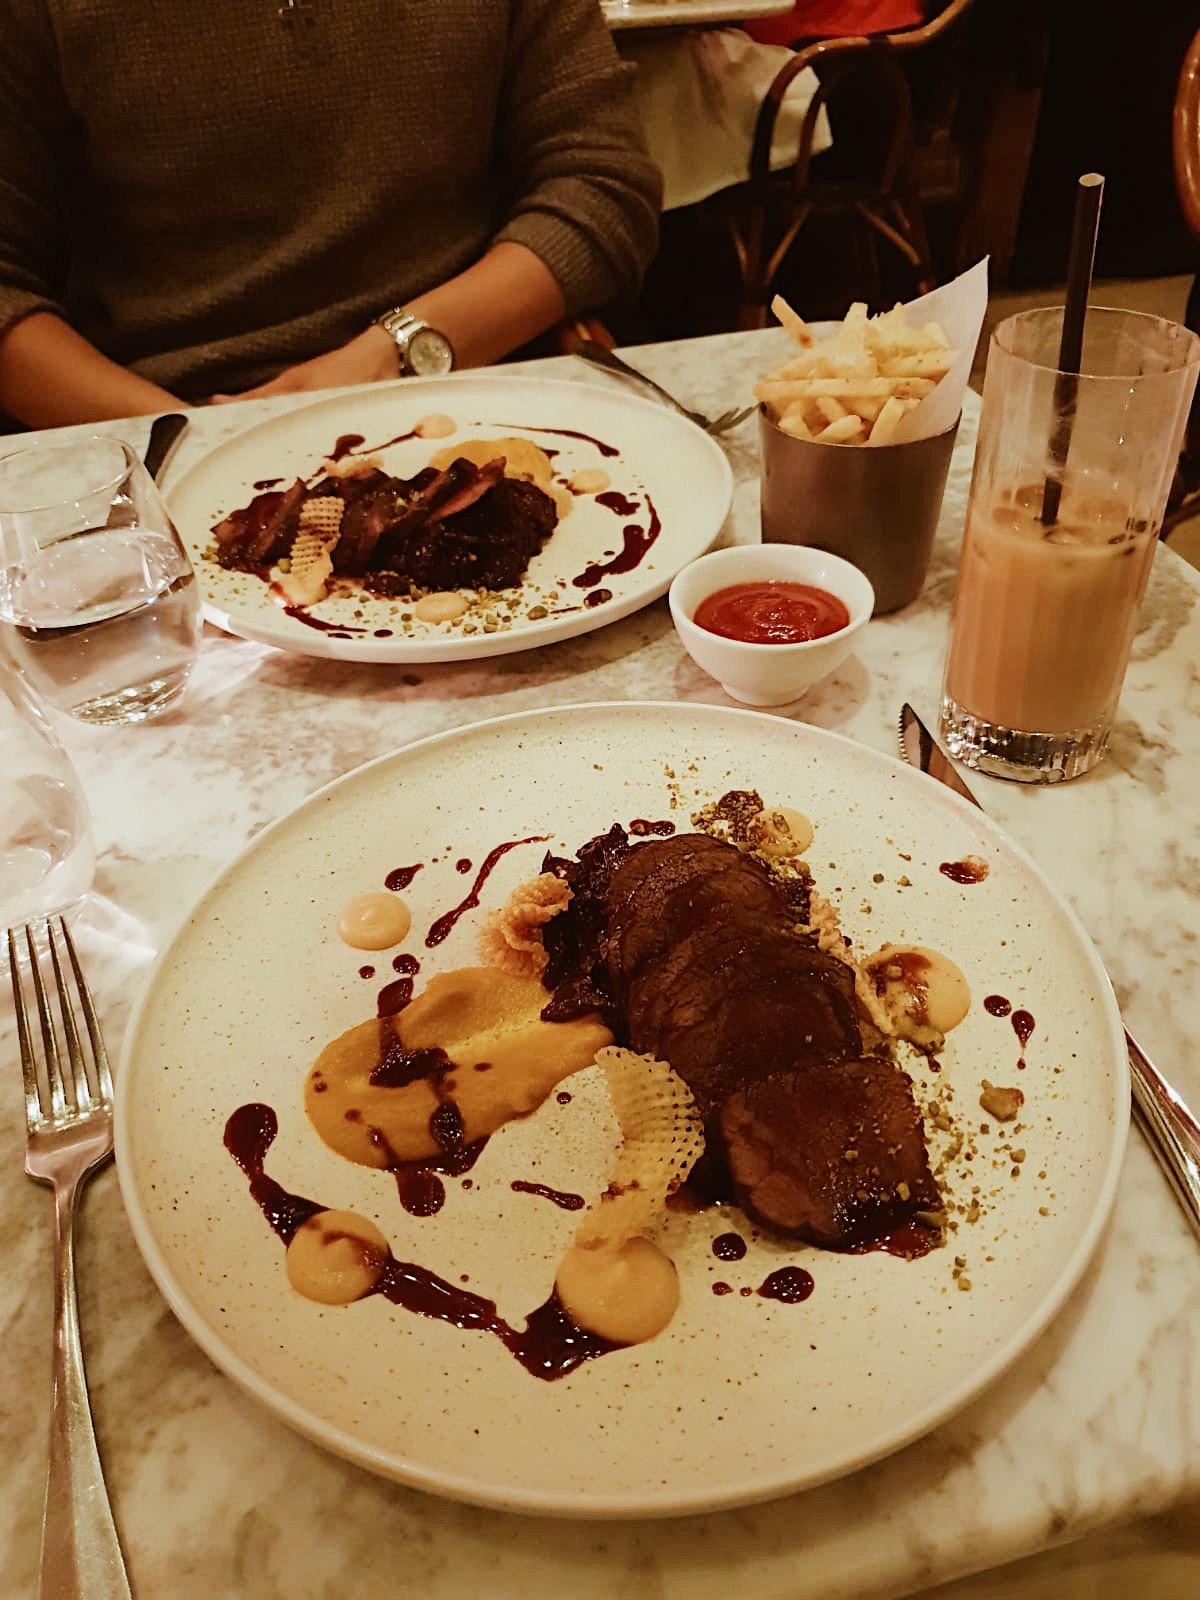 dalloway terrace food london